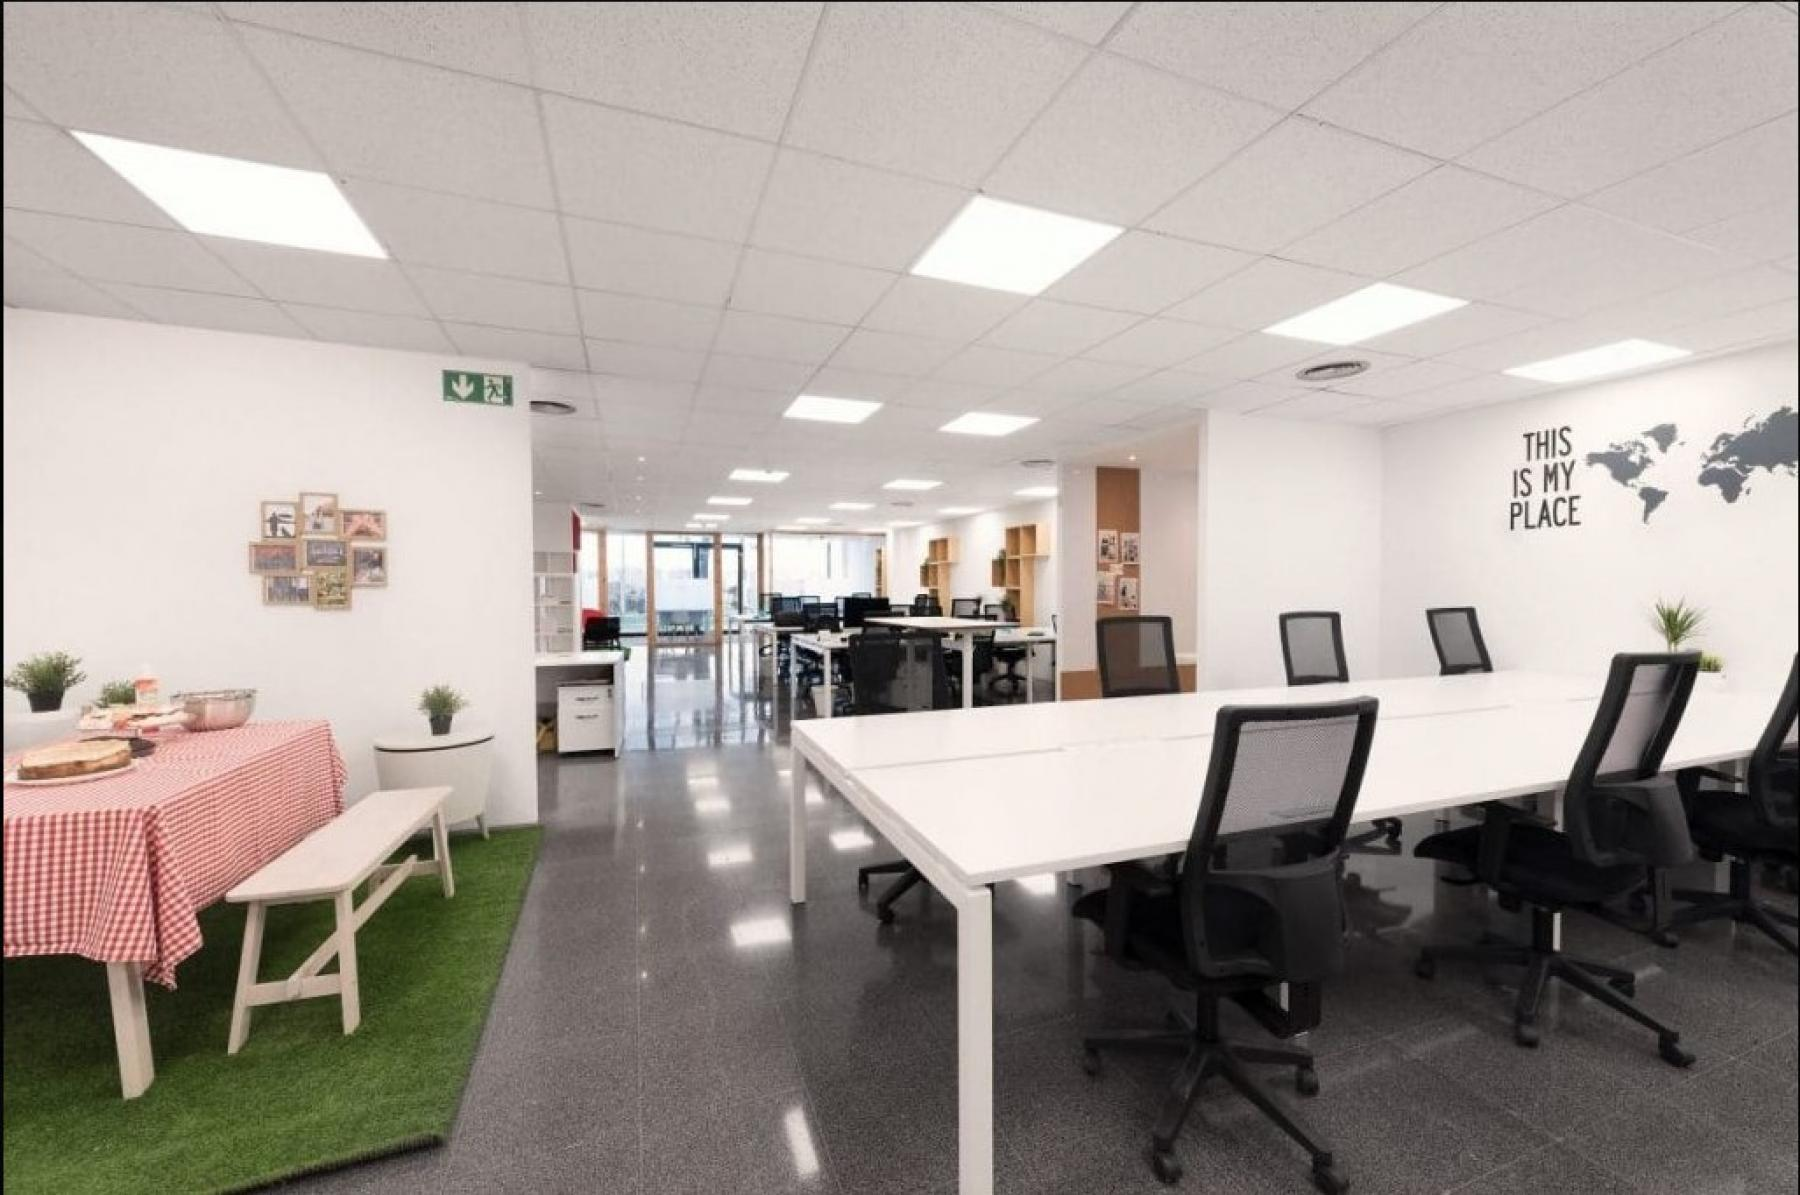 Alquilar oficinas Carretera Rubí 88, Barcelona (1)